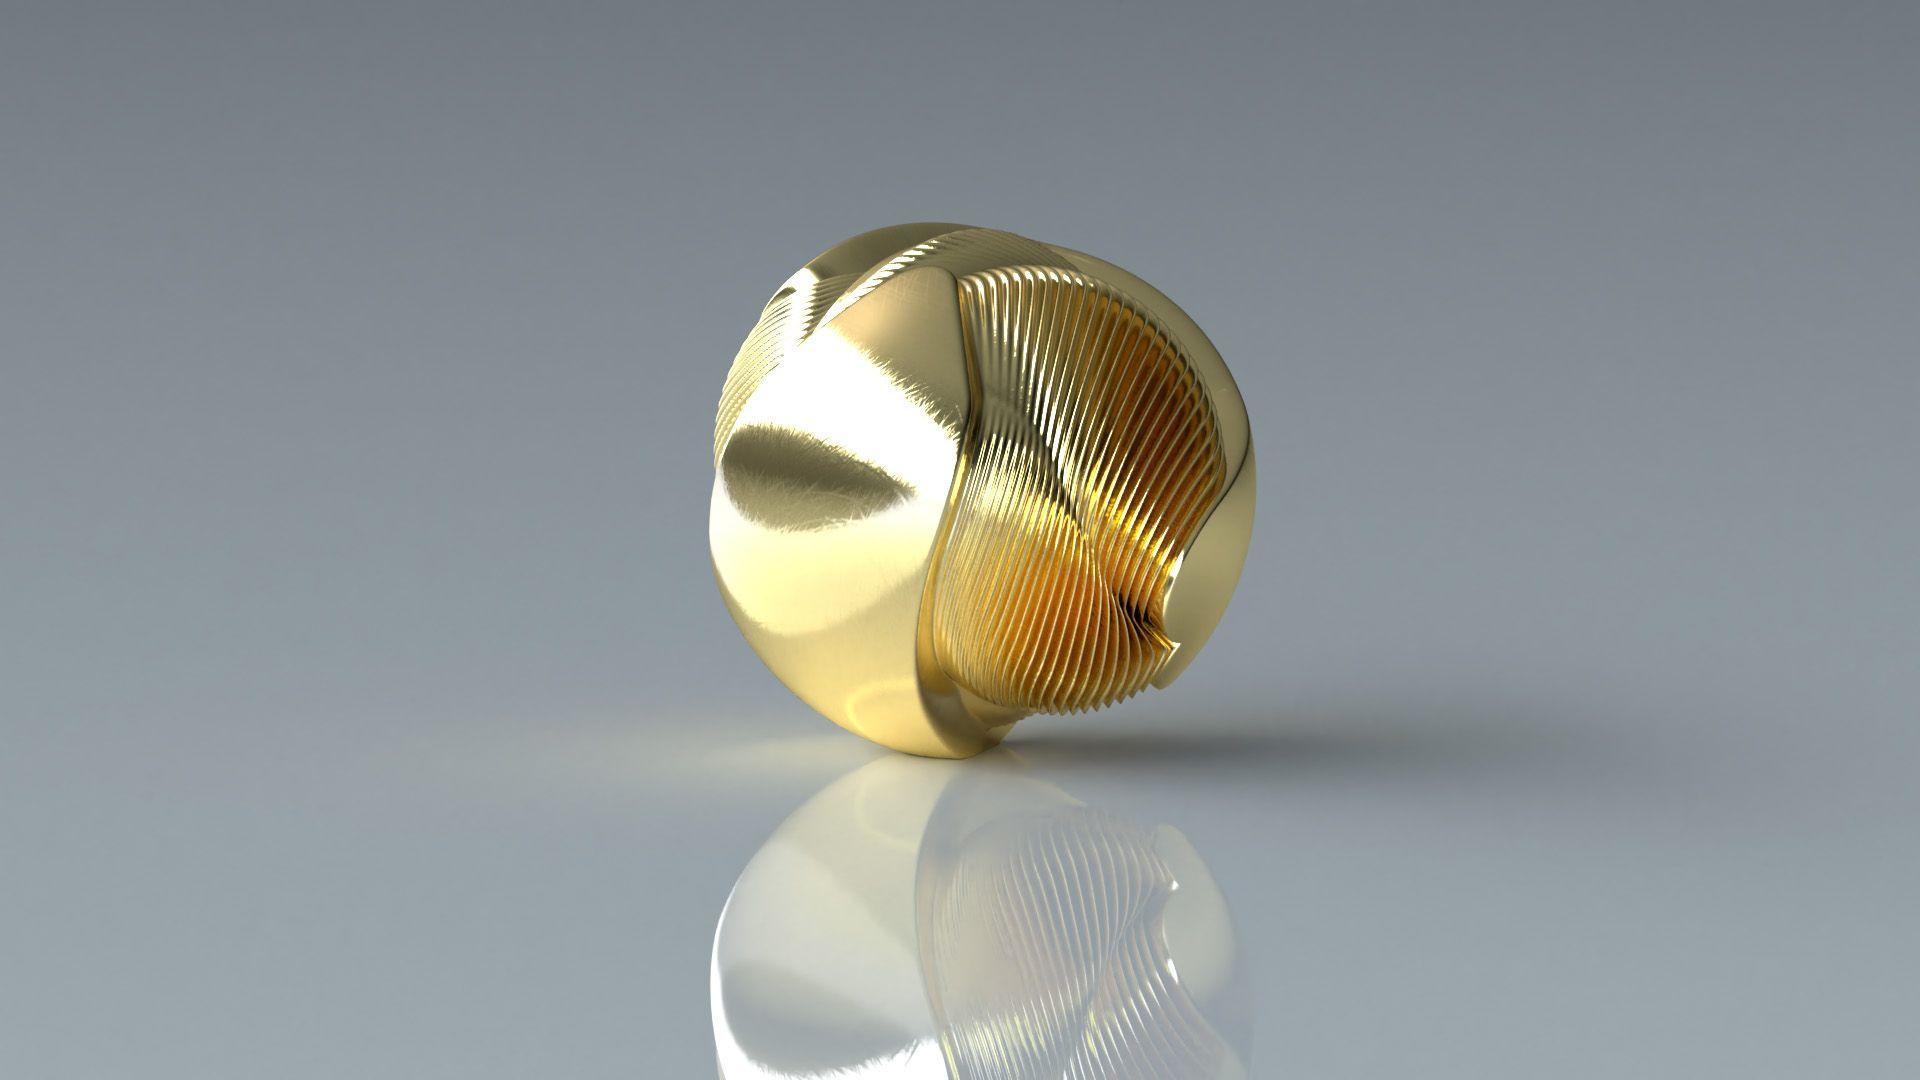 Adobe Dimension tutorial abstract 3D visual